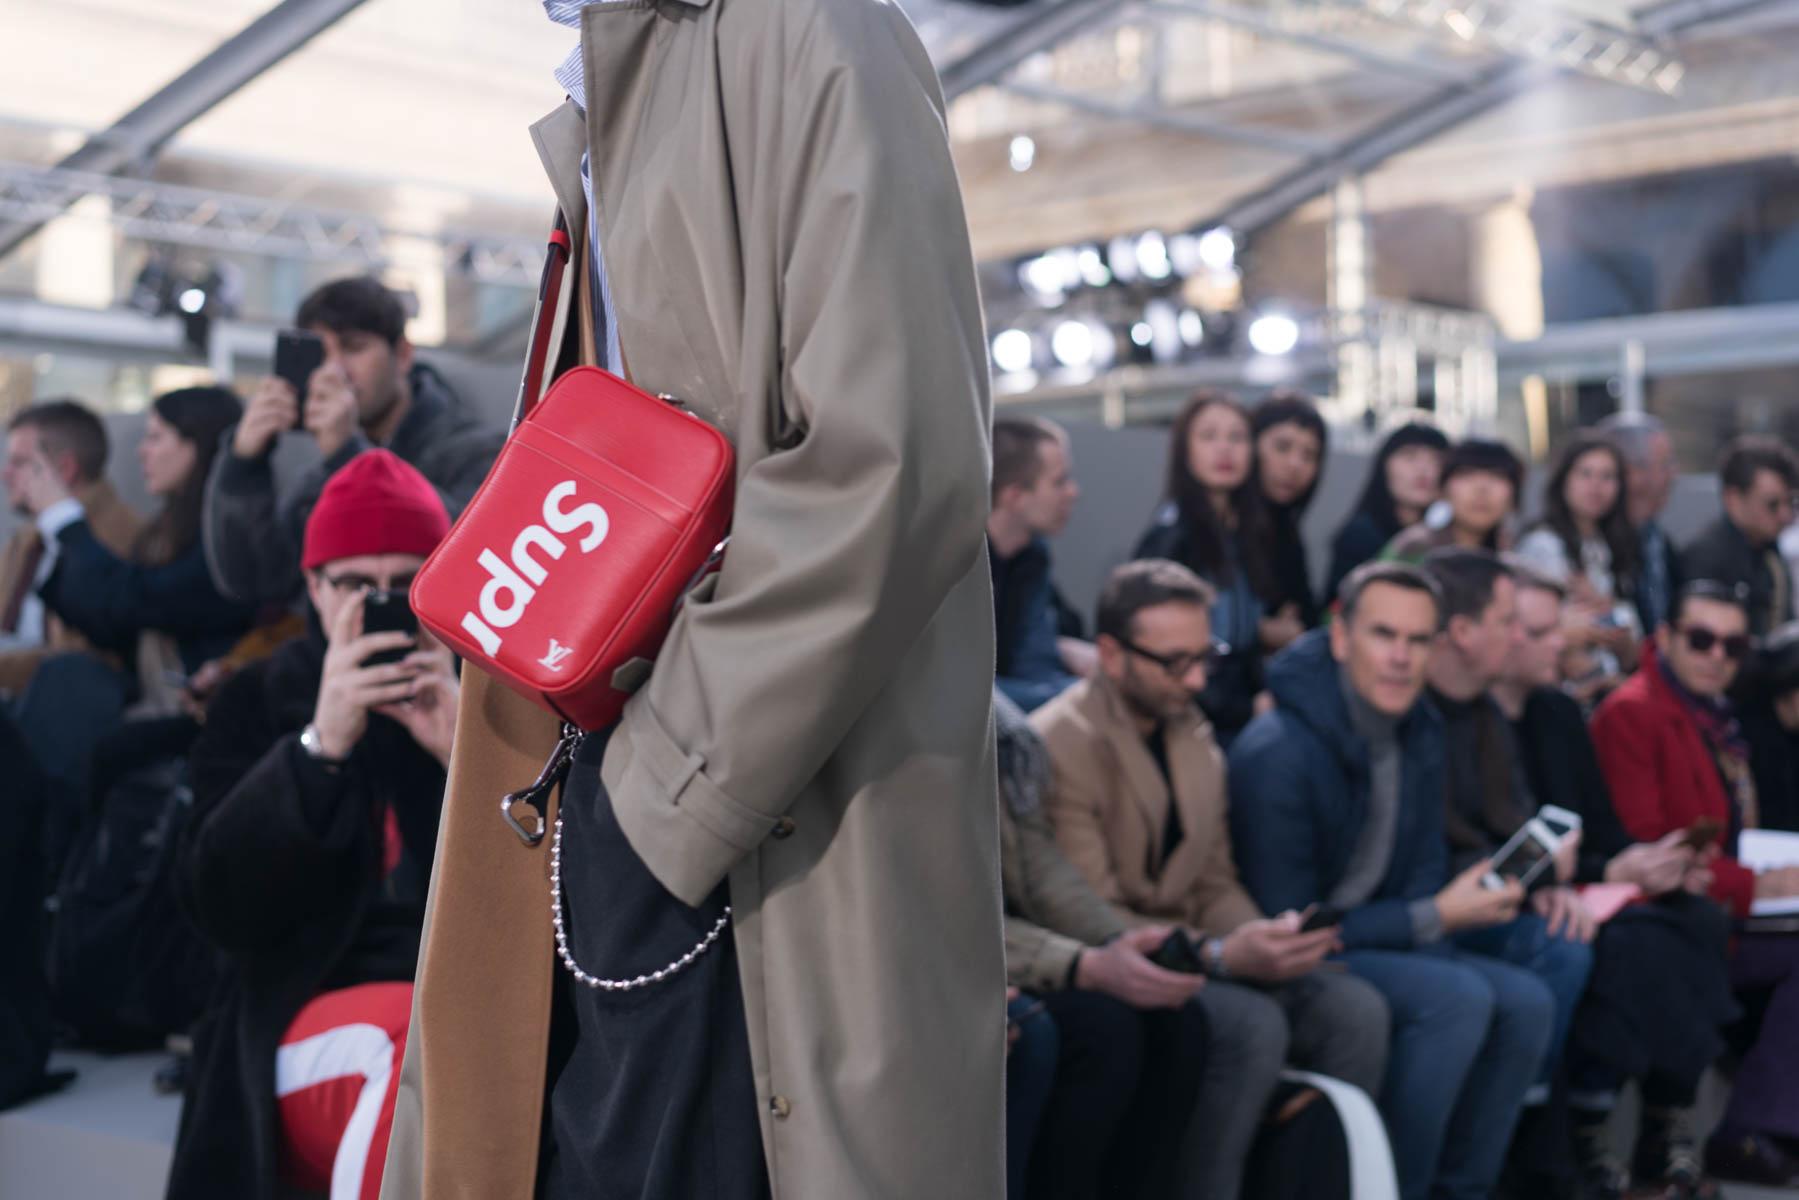 Supreme x Louis Vuitton Items 2017 Fall Winter Show